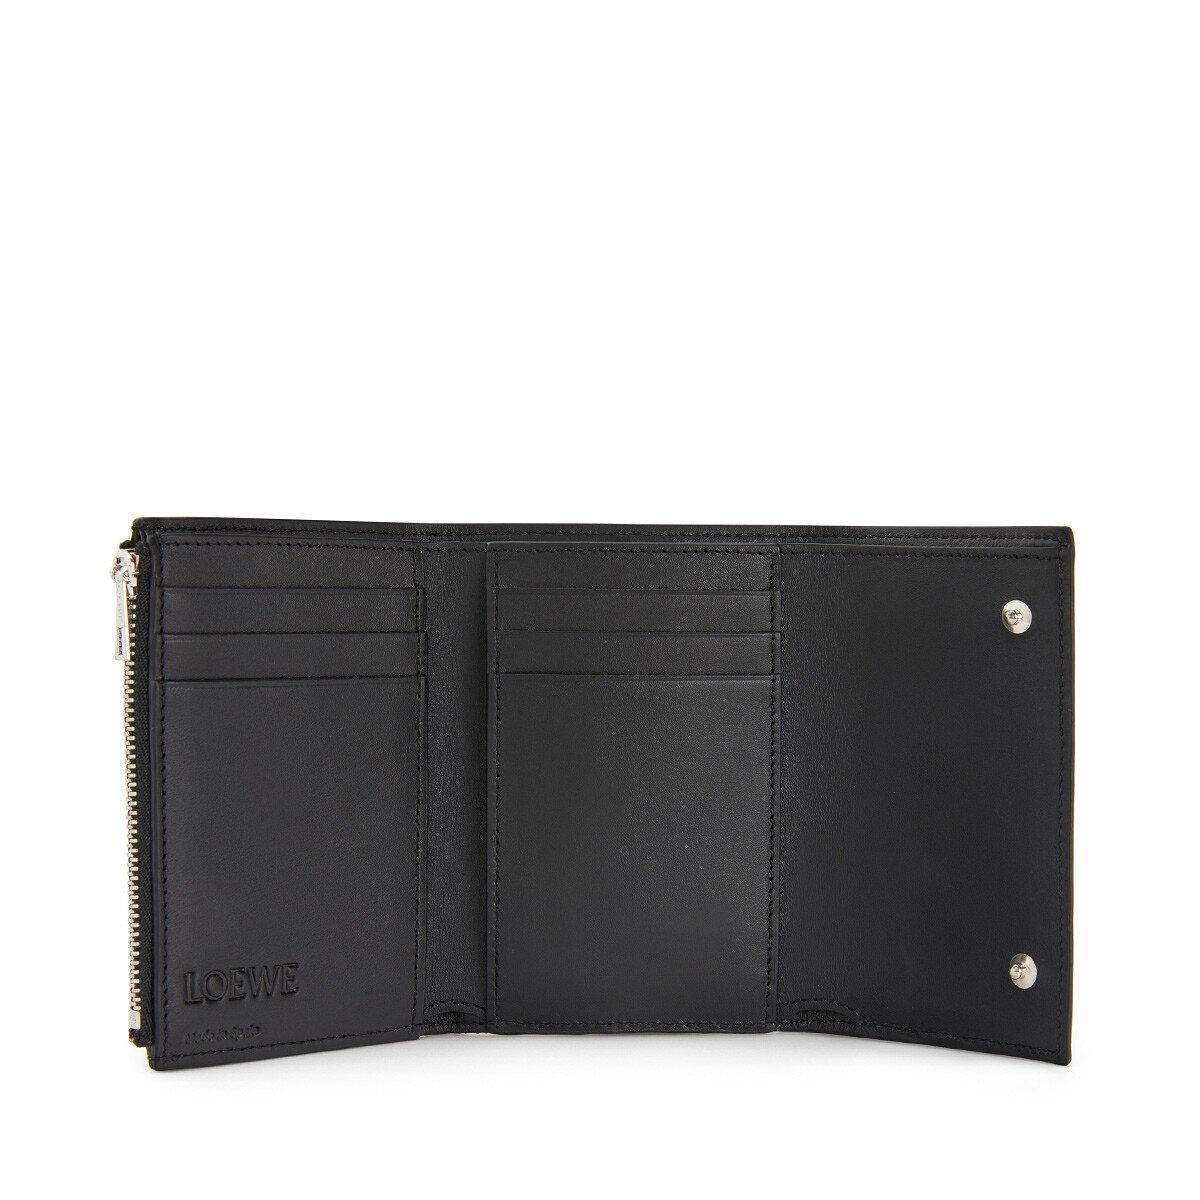 LOEWE Small Vertical Wallet Tan/Multicolor front